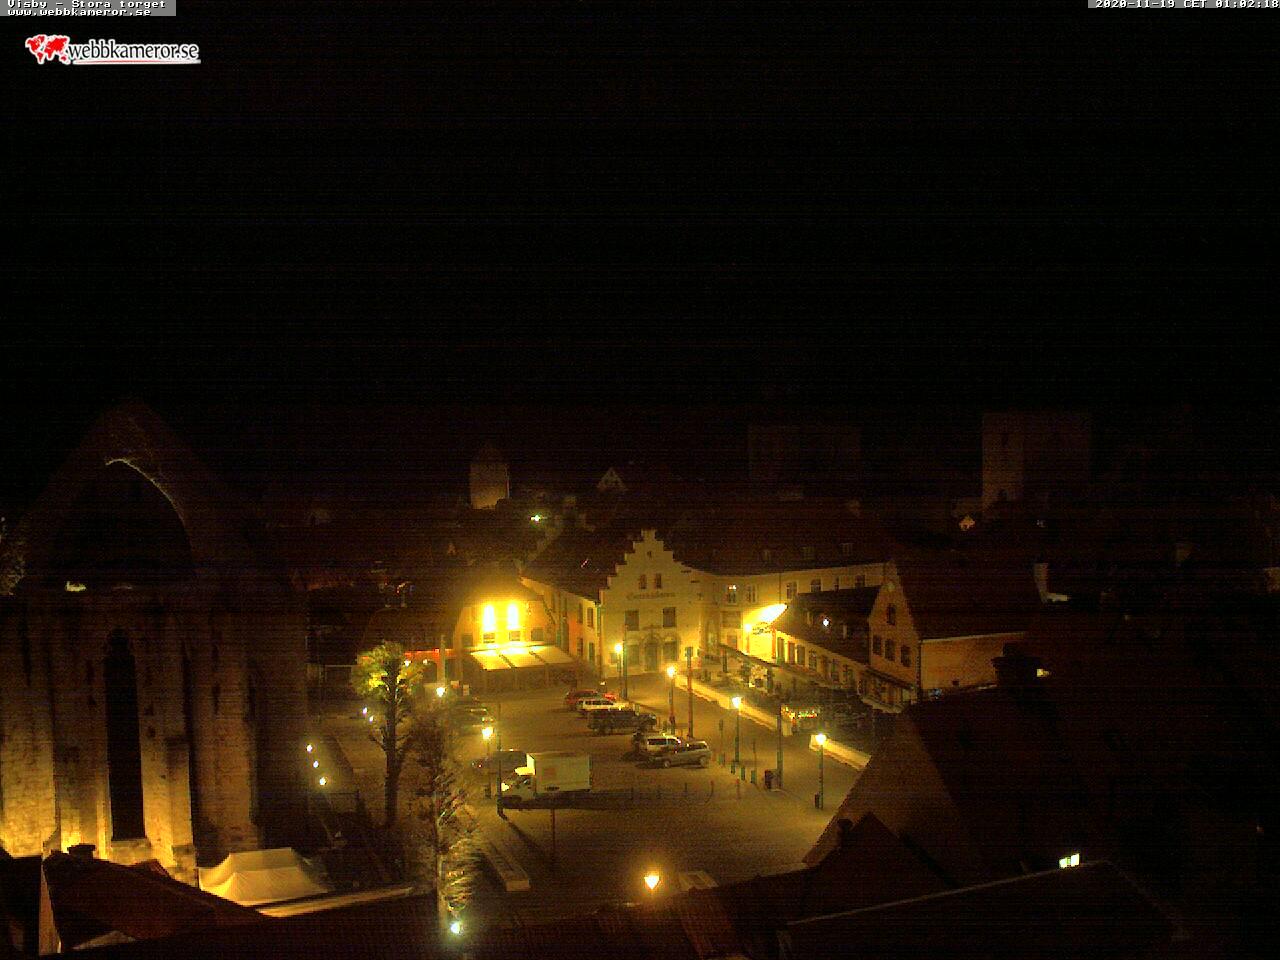 stora brös webcam live